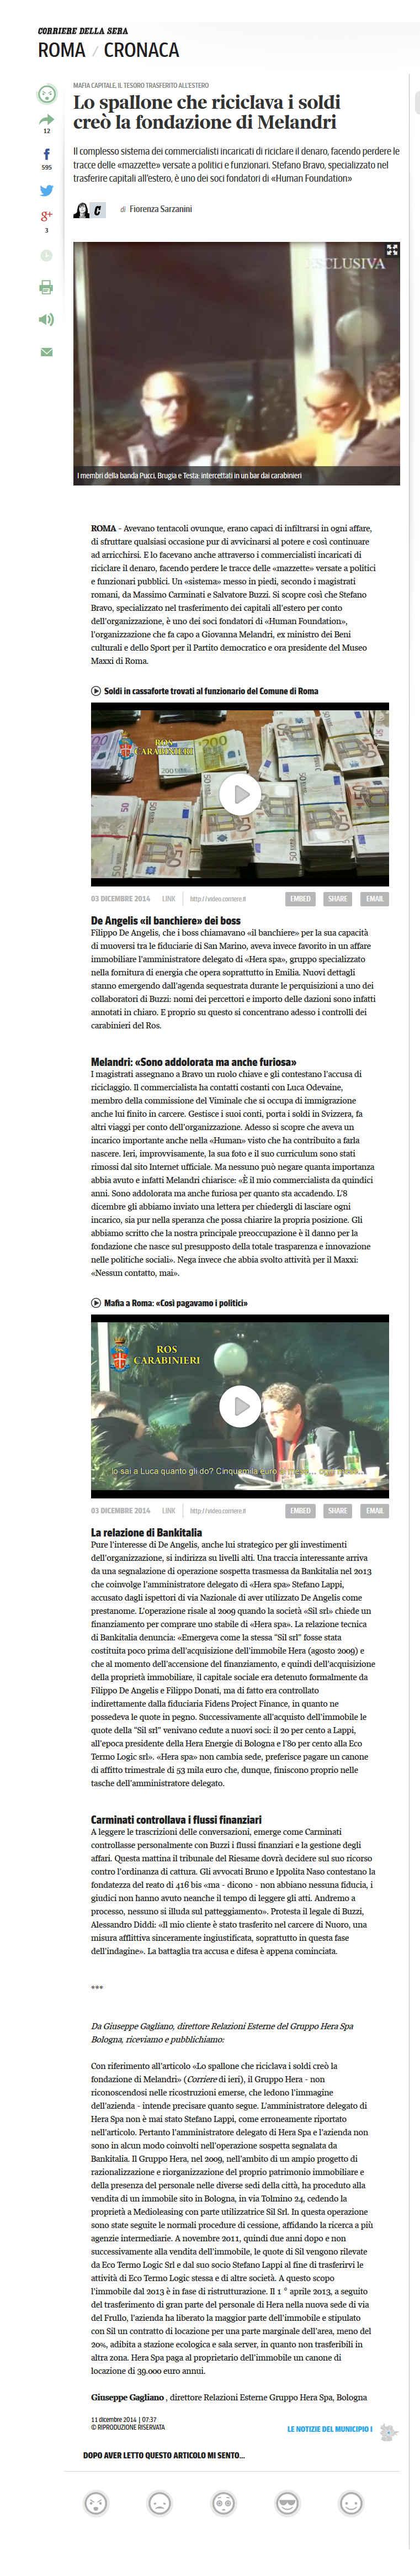 screenshot-roma-corriere-it-2016-10-24-11-36-47